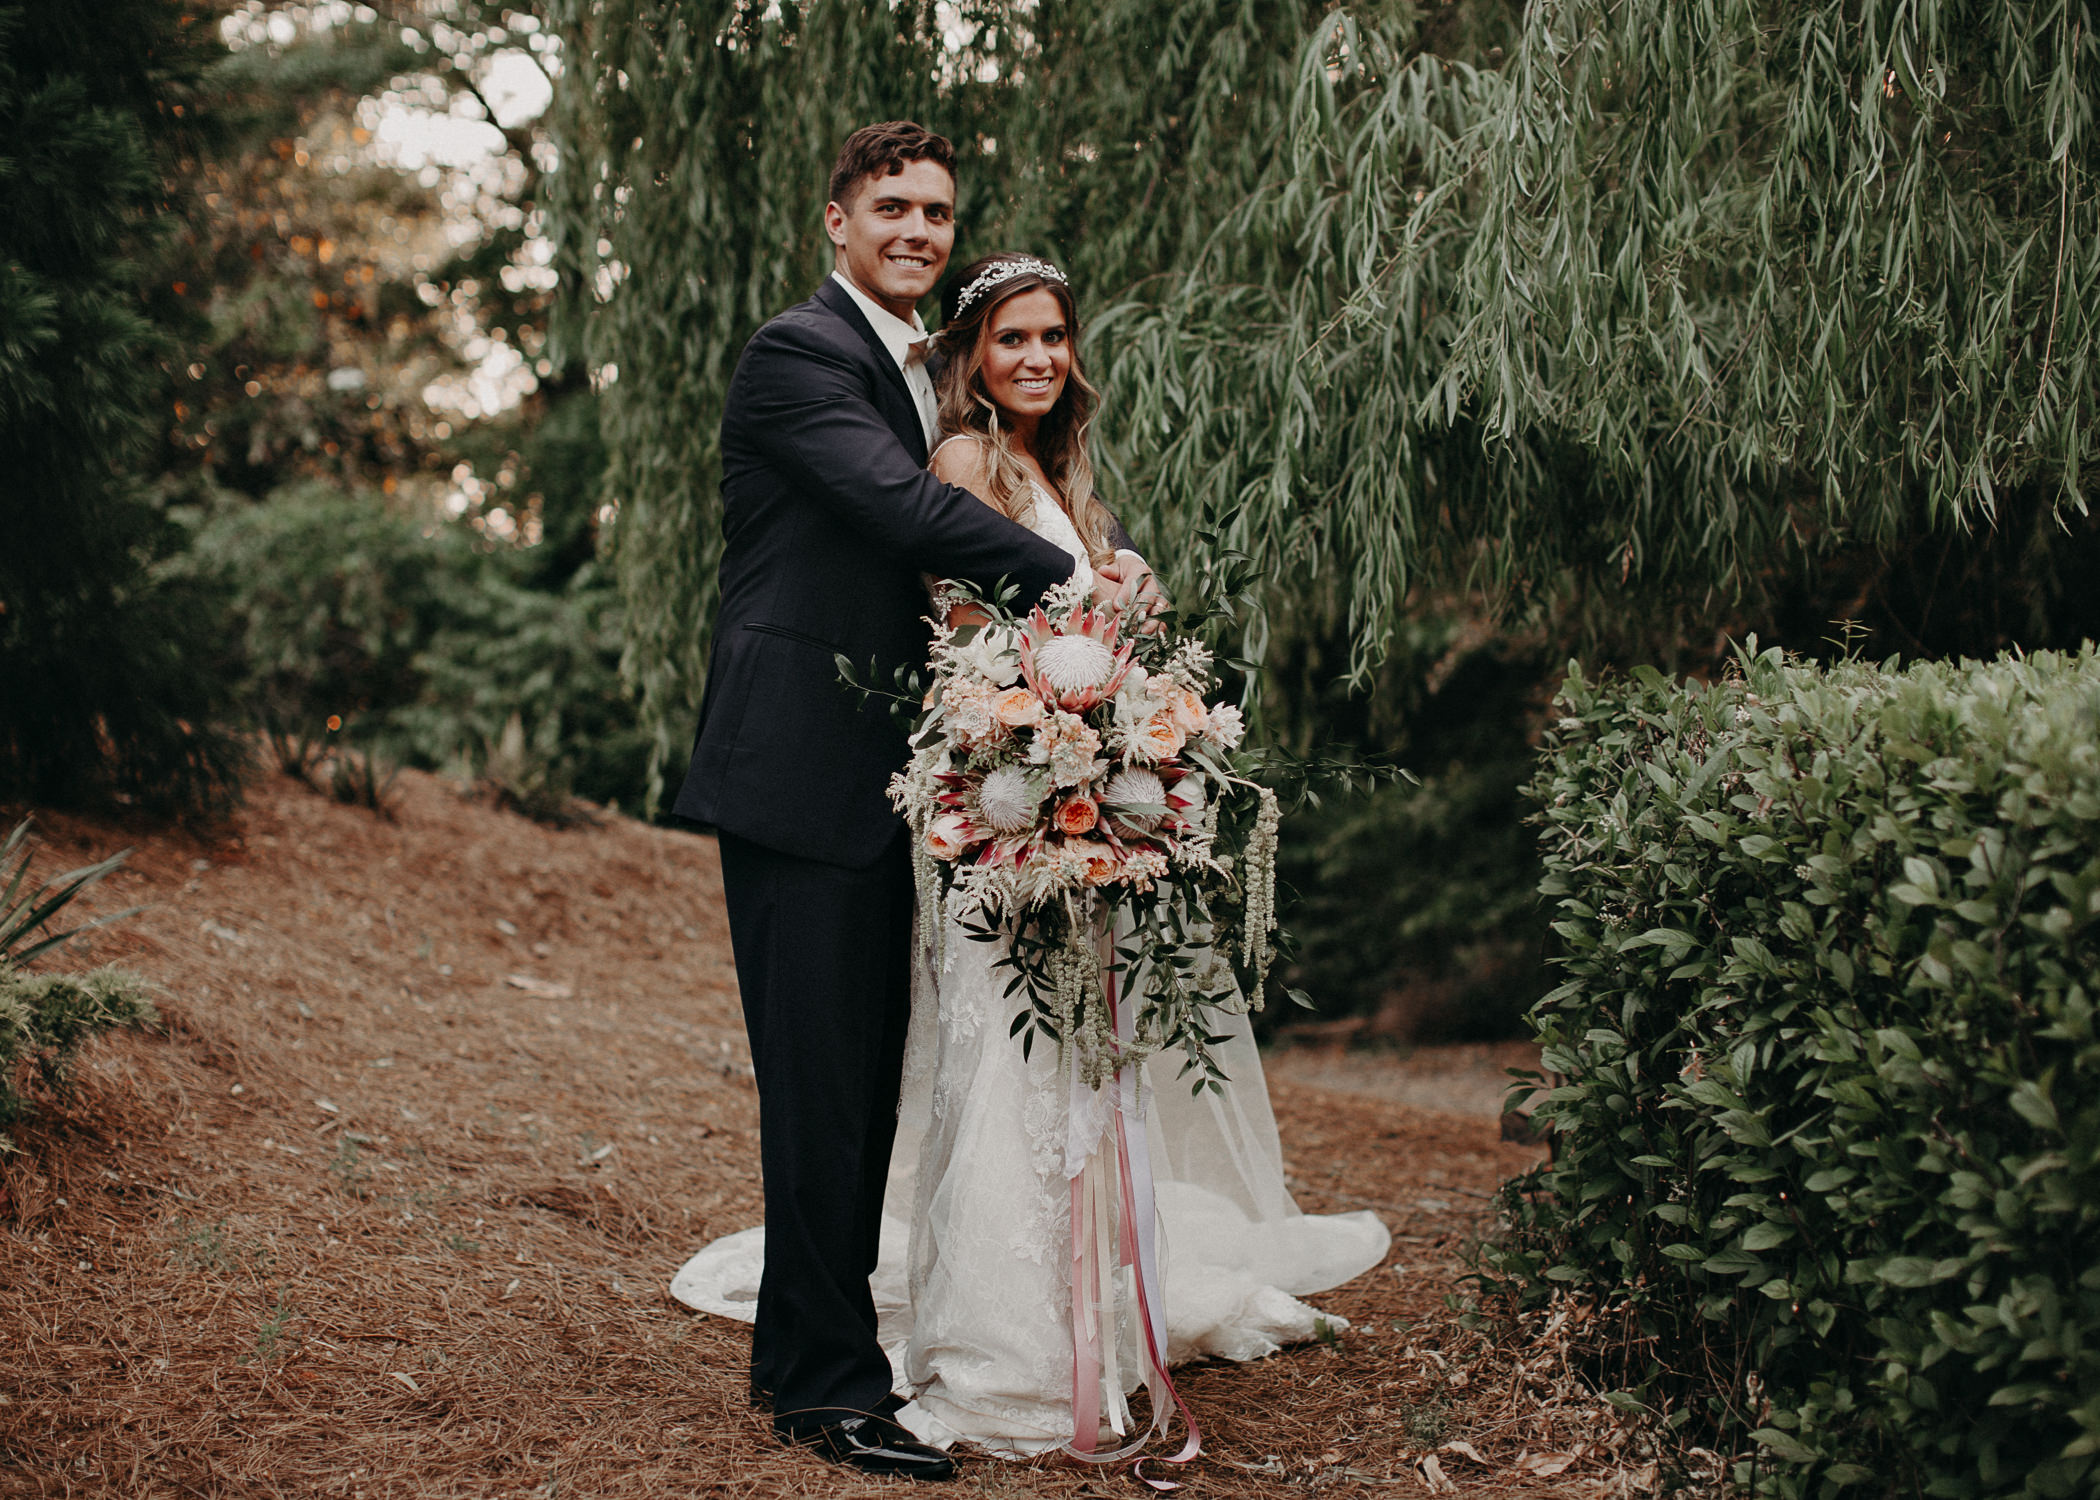 78Carl House Wedding Venue Ga, Atlanta Wedding Photographer - Boho, Bohemian, Junebug Weddings, Vintage, Retro, Trendy. Aline Marin Photography. .jpg